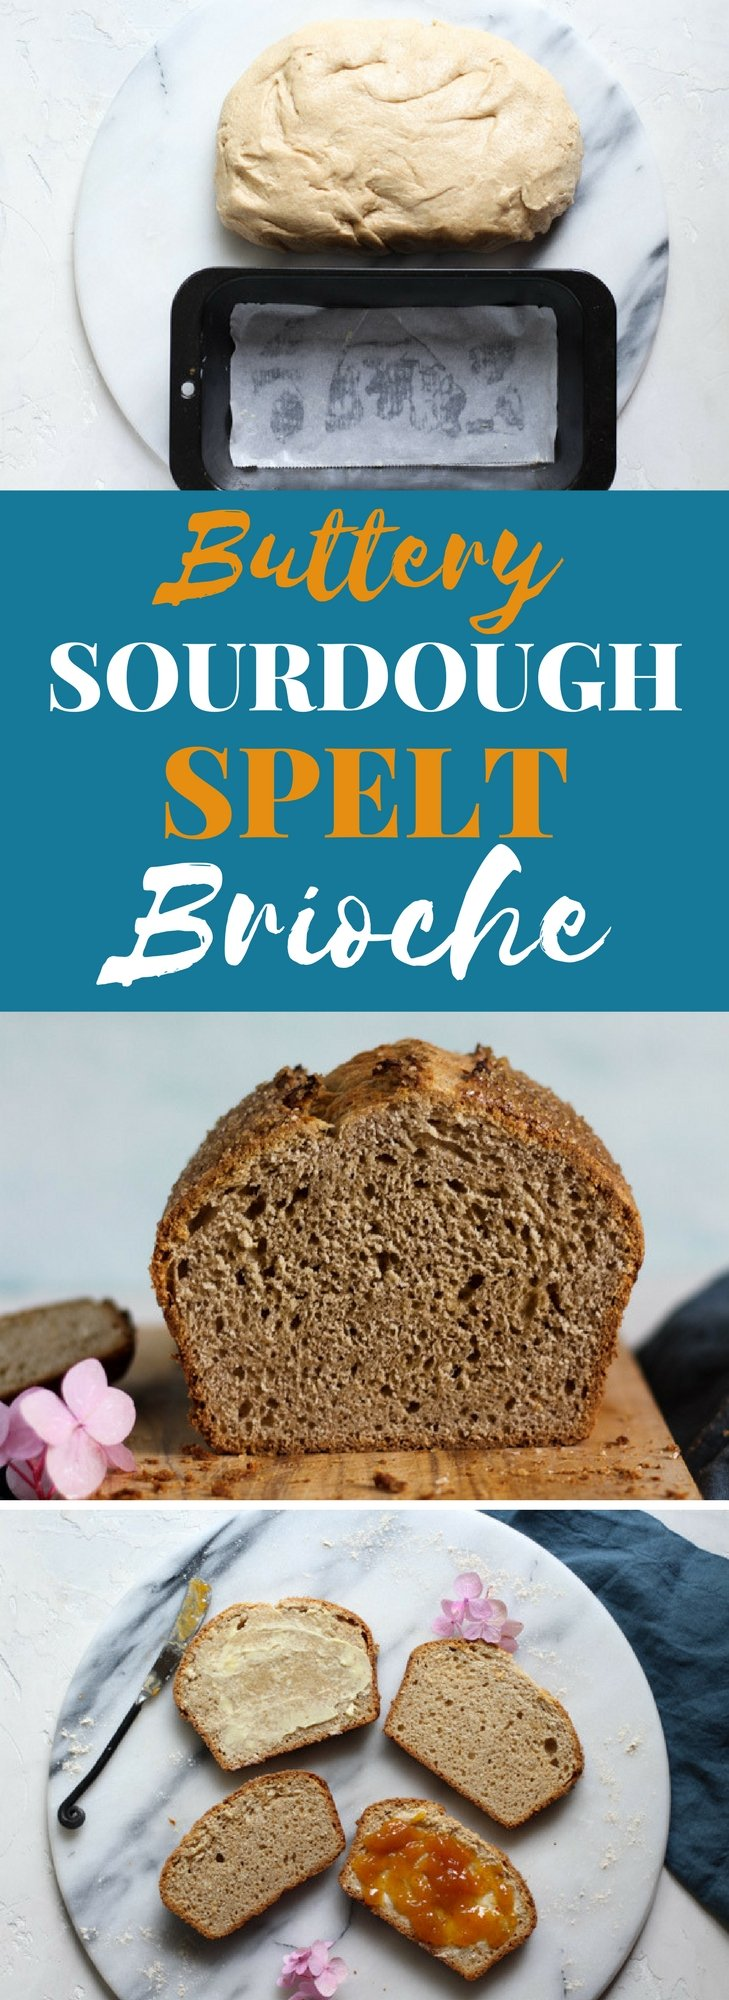 Buttery Sourdough Spelt Brioche Bread Recipe is food for the gods!